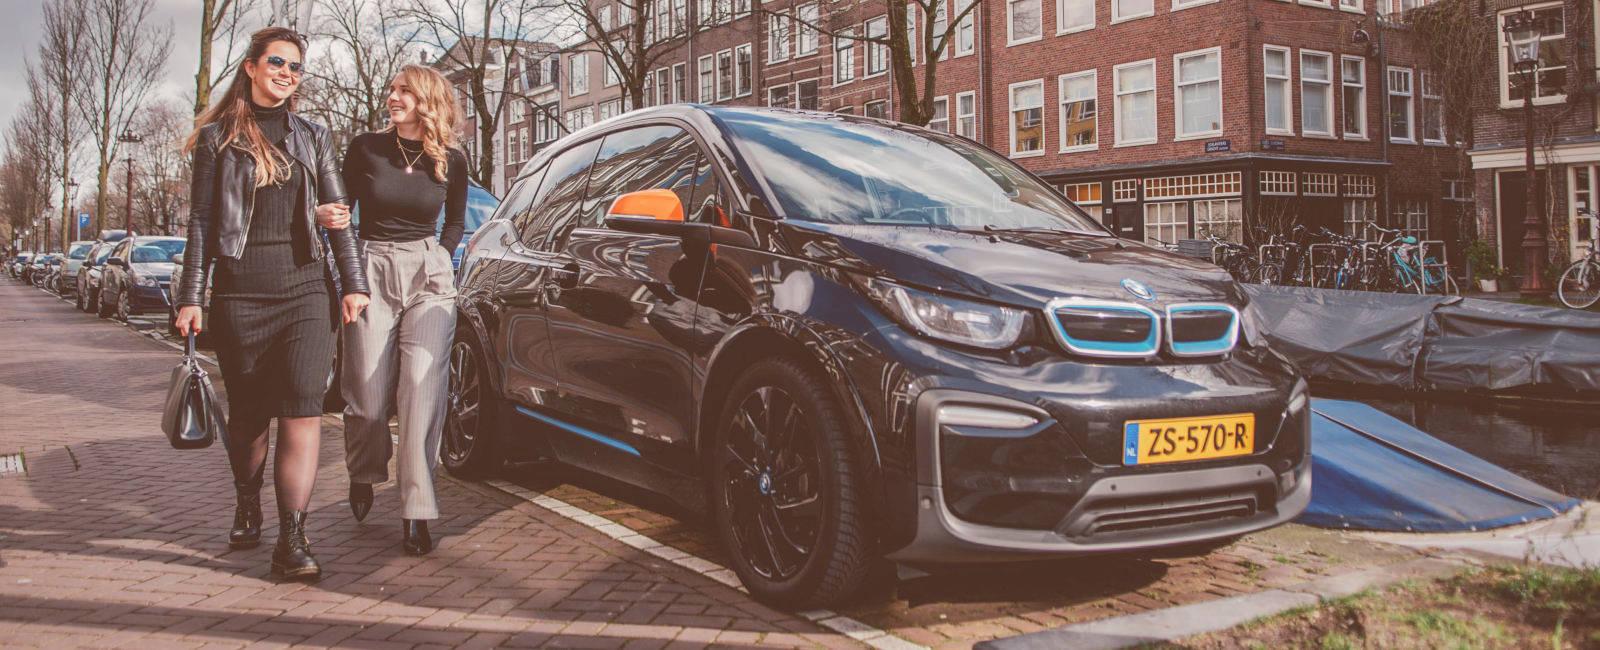 sixt share carsharing amsterdam 1